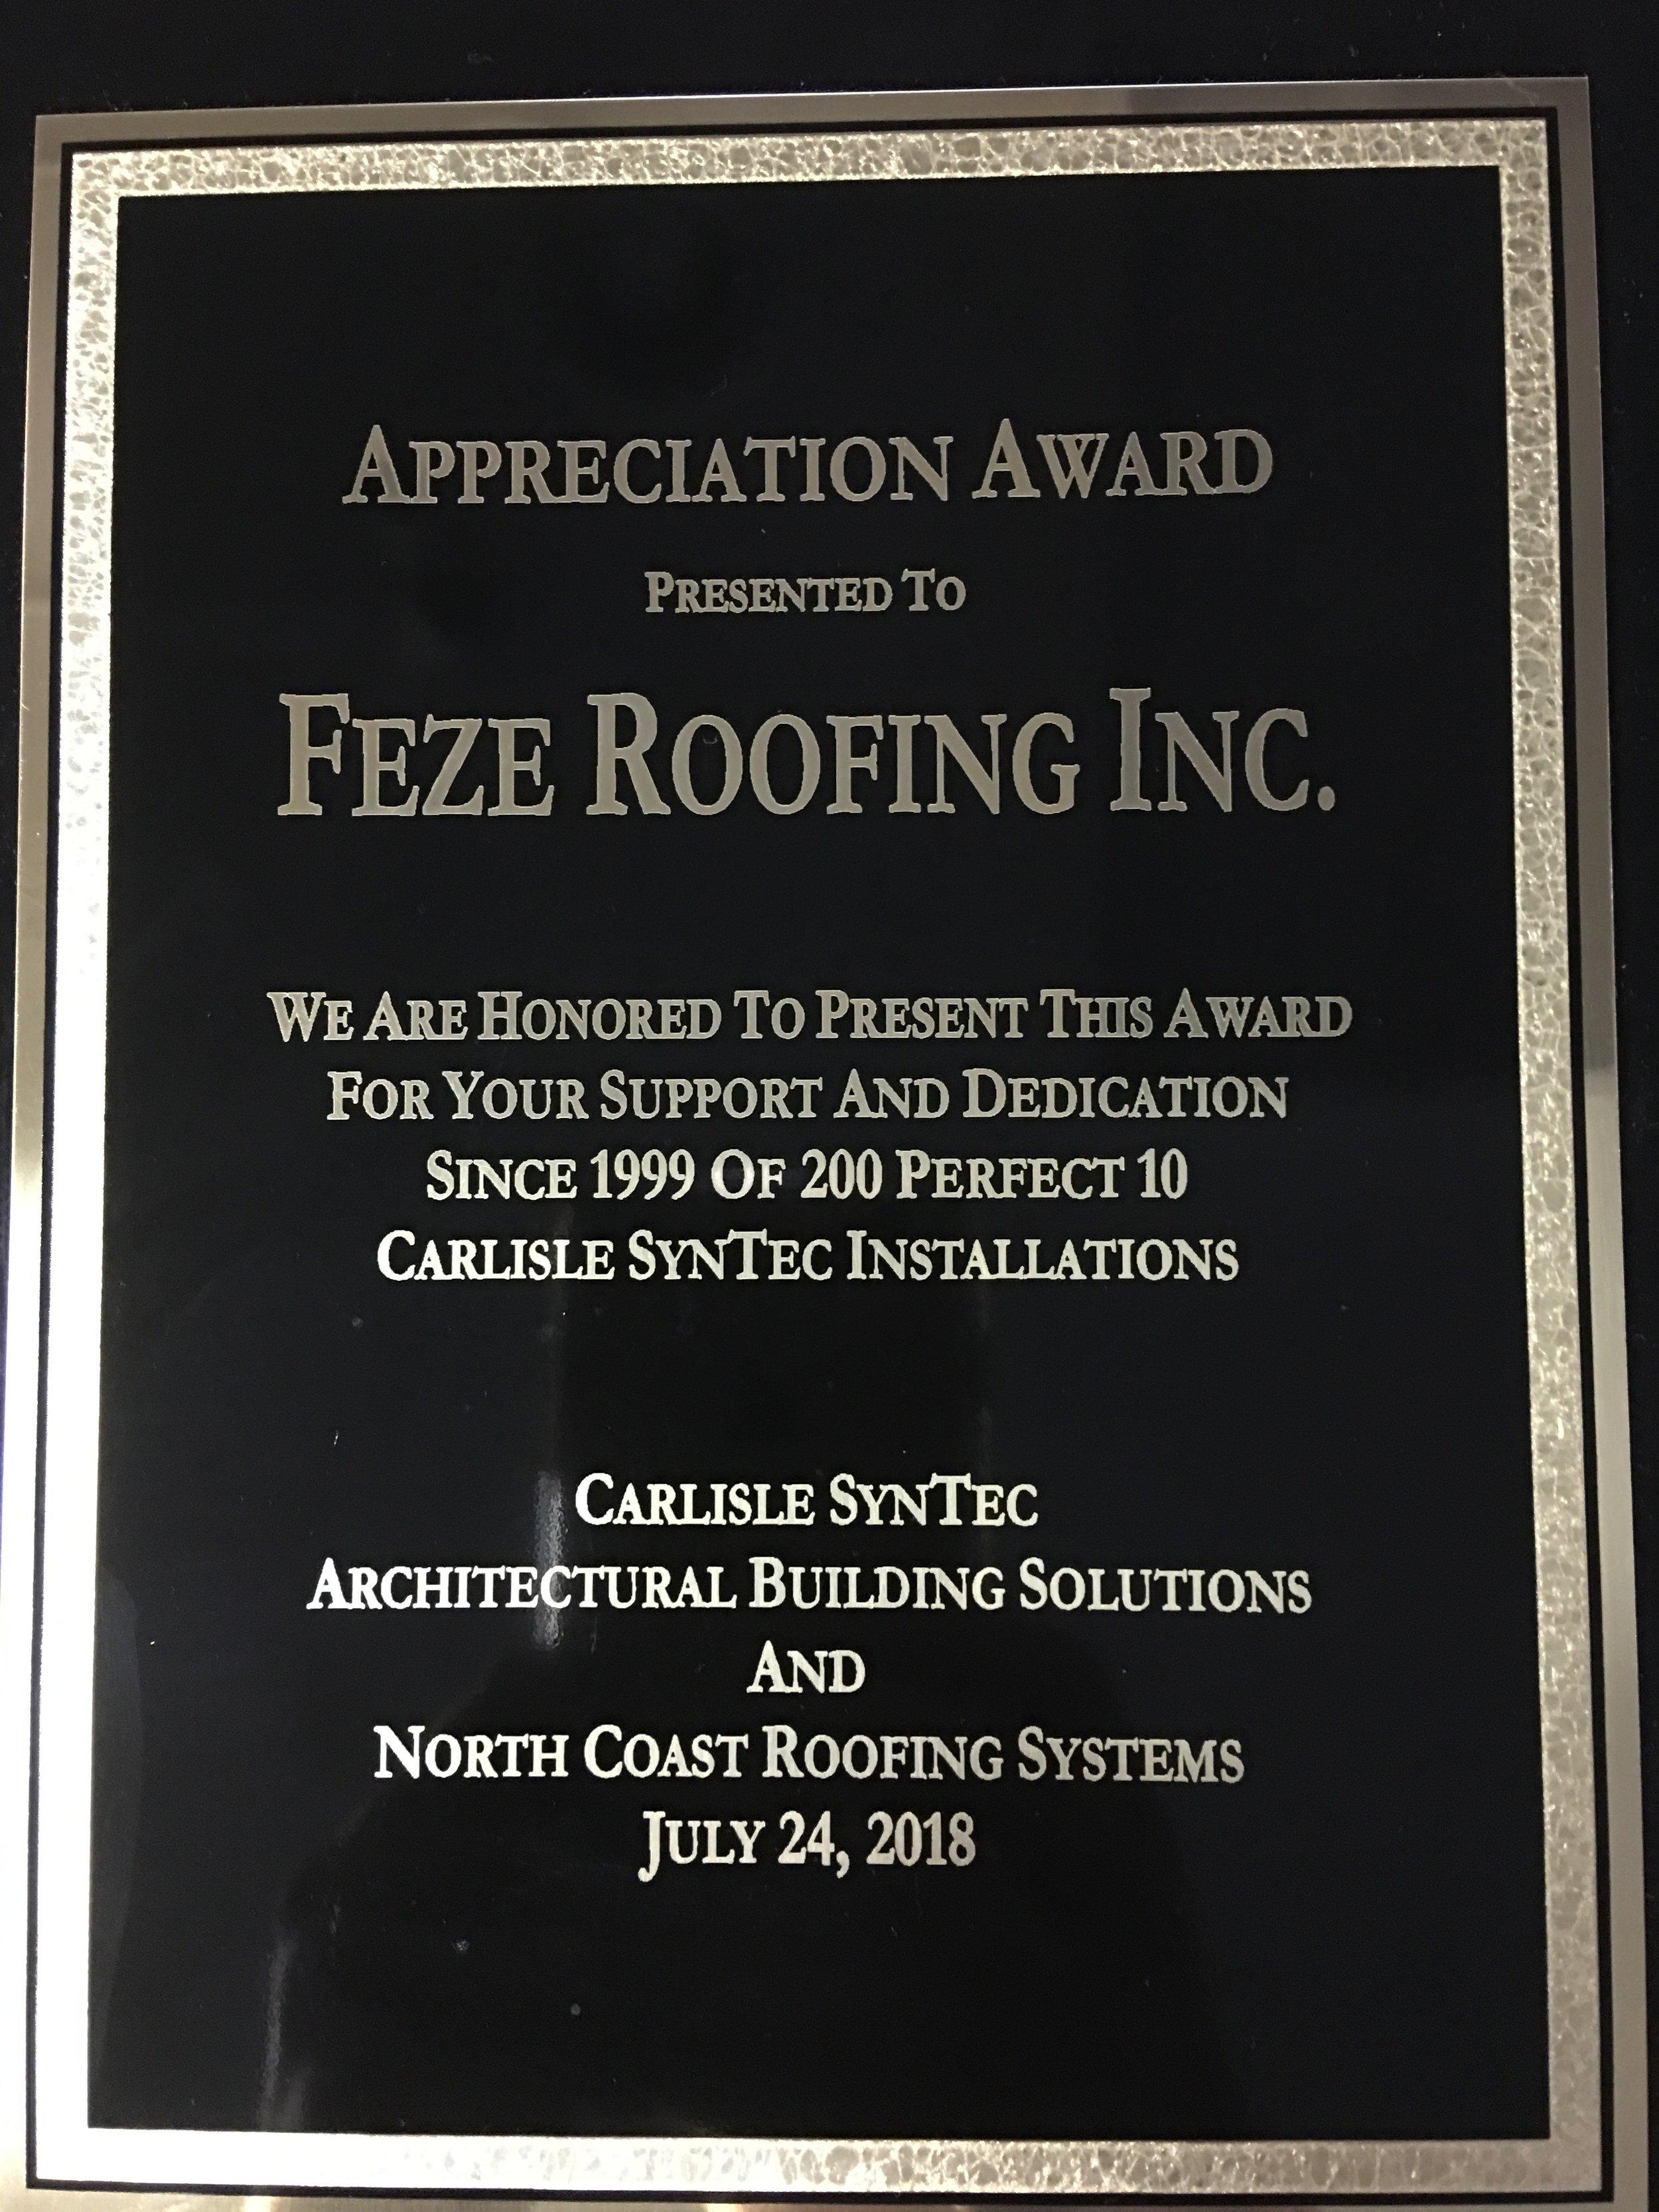 Elmhurst Roofing Team | Feze Roofing Appreciation Award